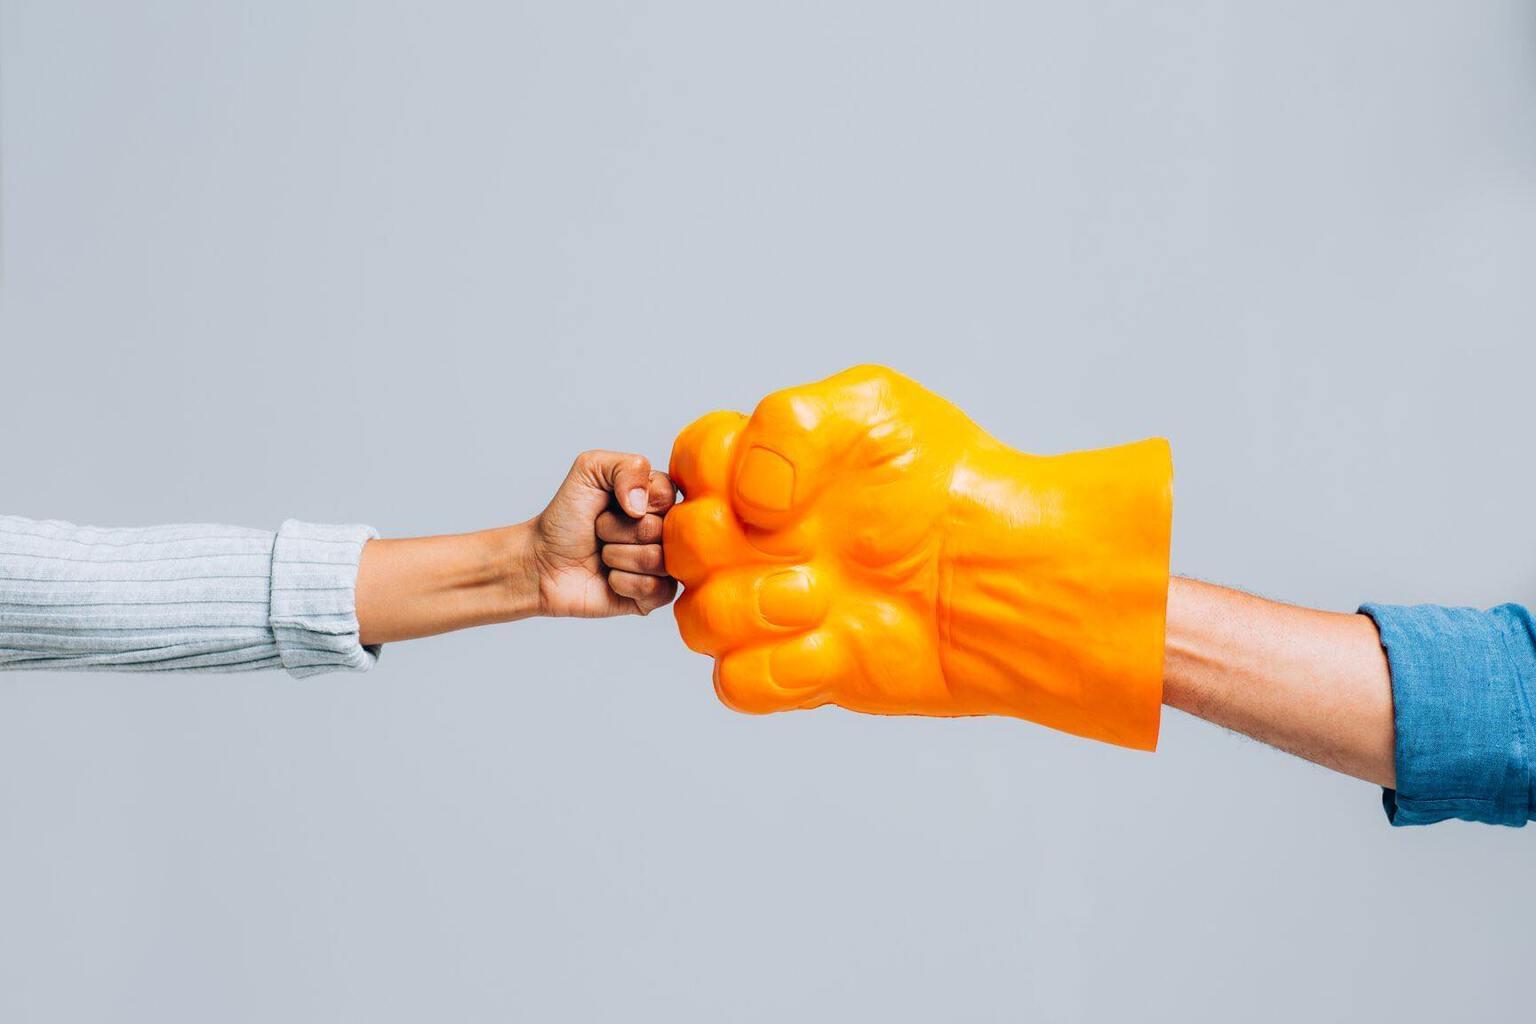 Frases de impacto para conquistar clientes